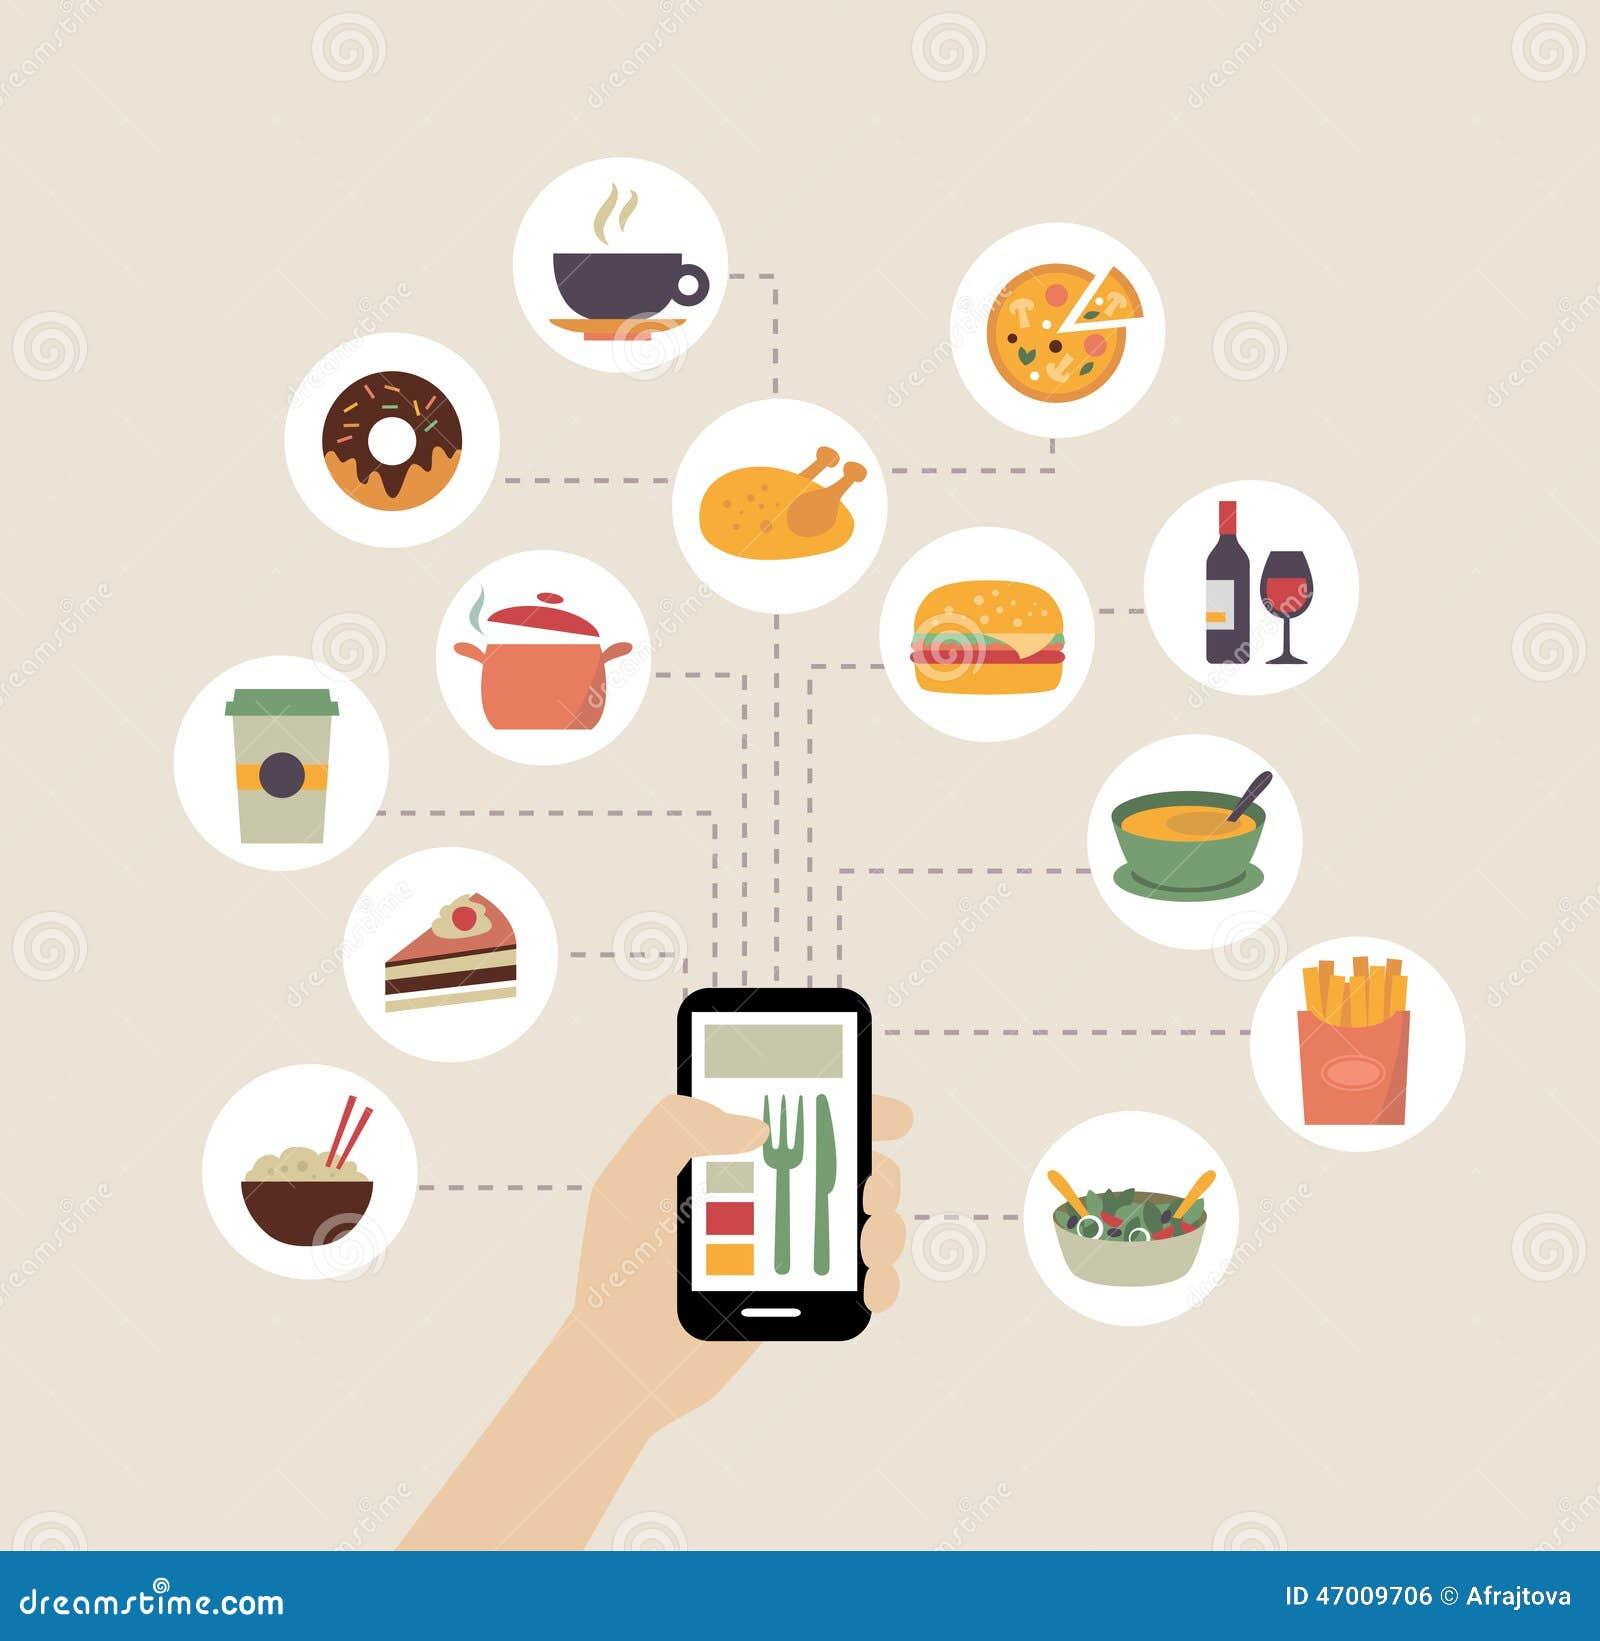 Ordering Food Online Or Food Blogging Stock Vector - Image ...